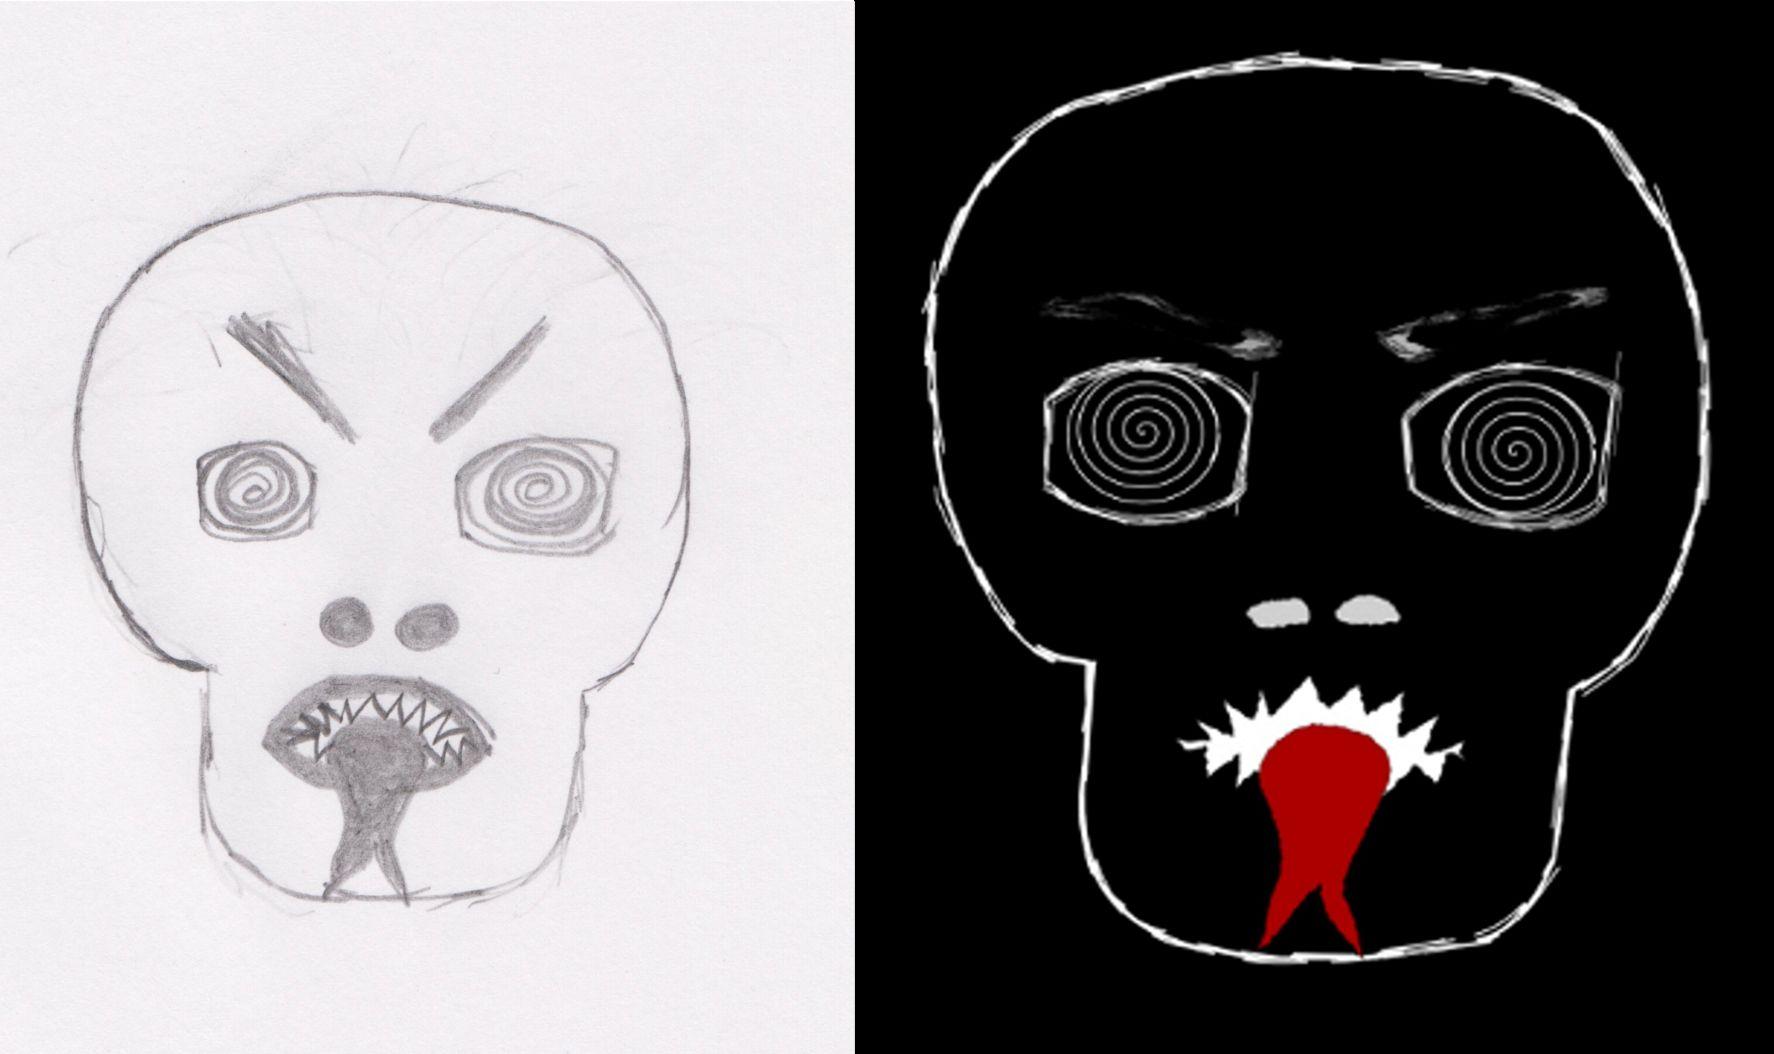 grotesque face: sketch and graphic - Fratze: Skizze und fertige Grafik